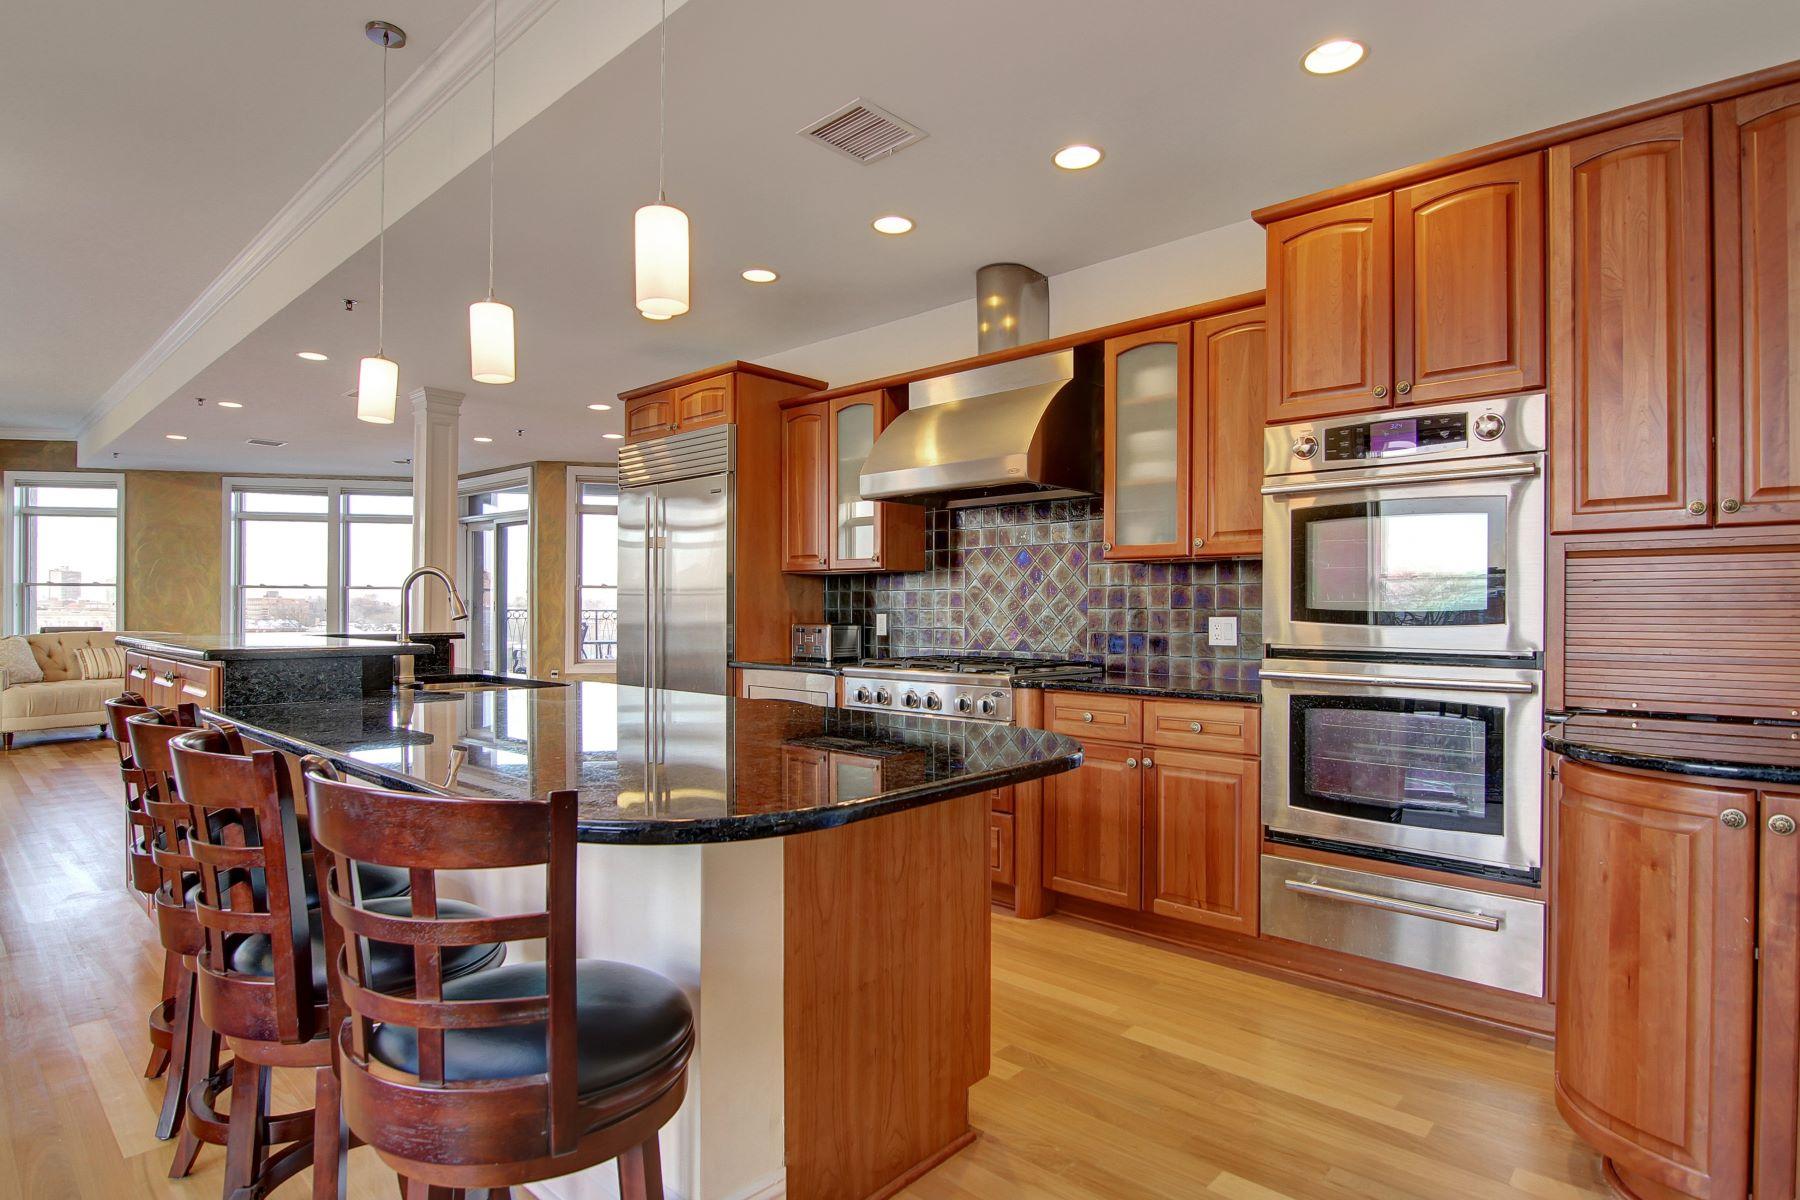 Condomínio para Venda às Elegance And Spacious Penthouse 550-564 Gregory Avenue #A11 Weehawken, Nova Jersey, 07086 Estados Unidos